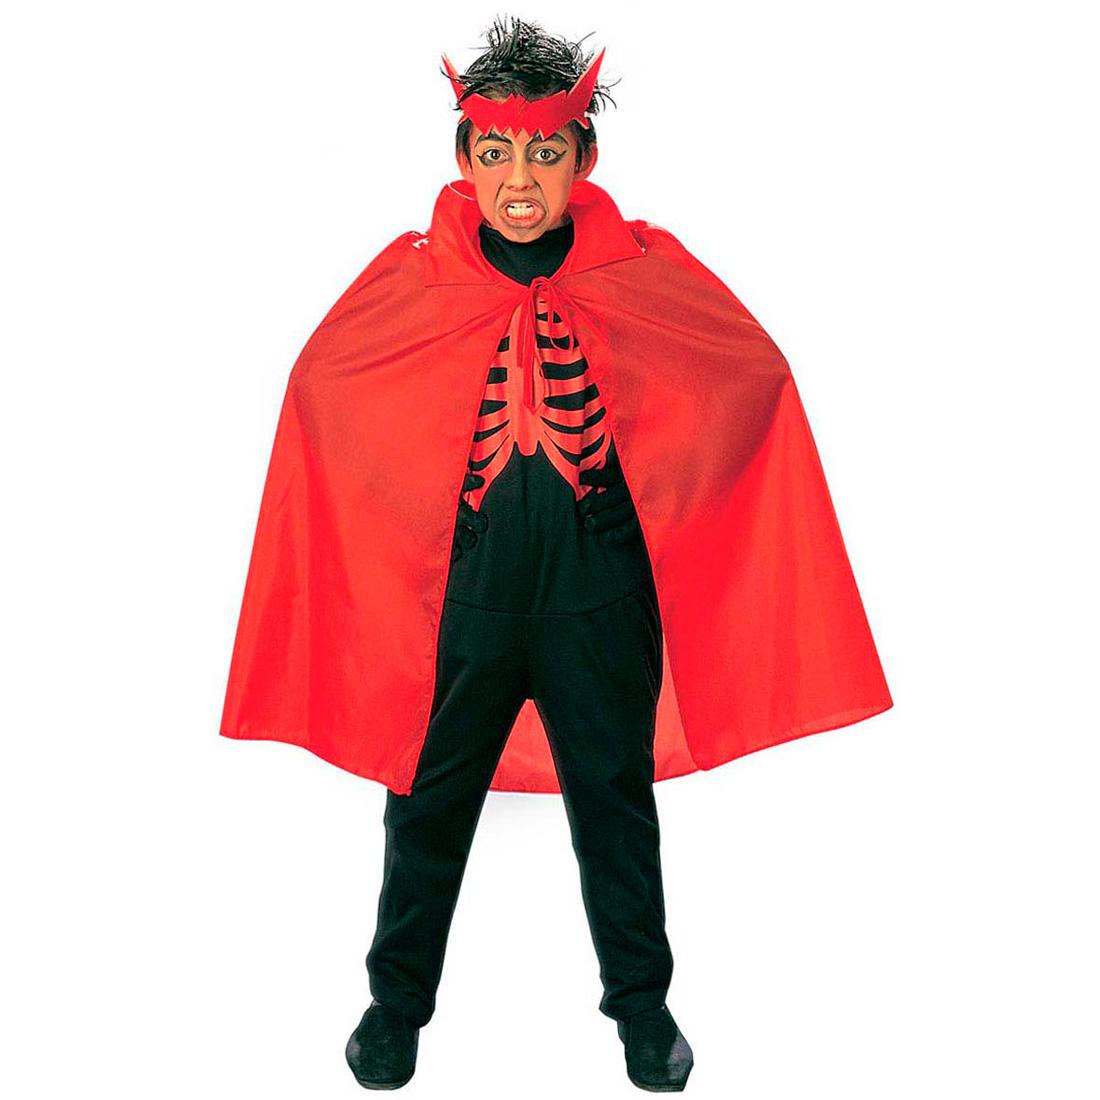 halloween cape vampir kinder vampirumhang rot kost m. Black Bedroom Furniture Sets. Home Design Ideas